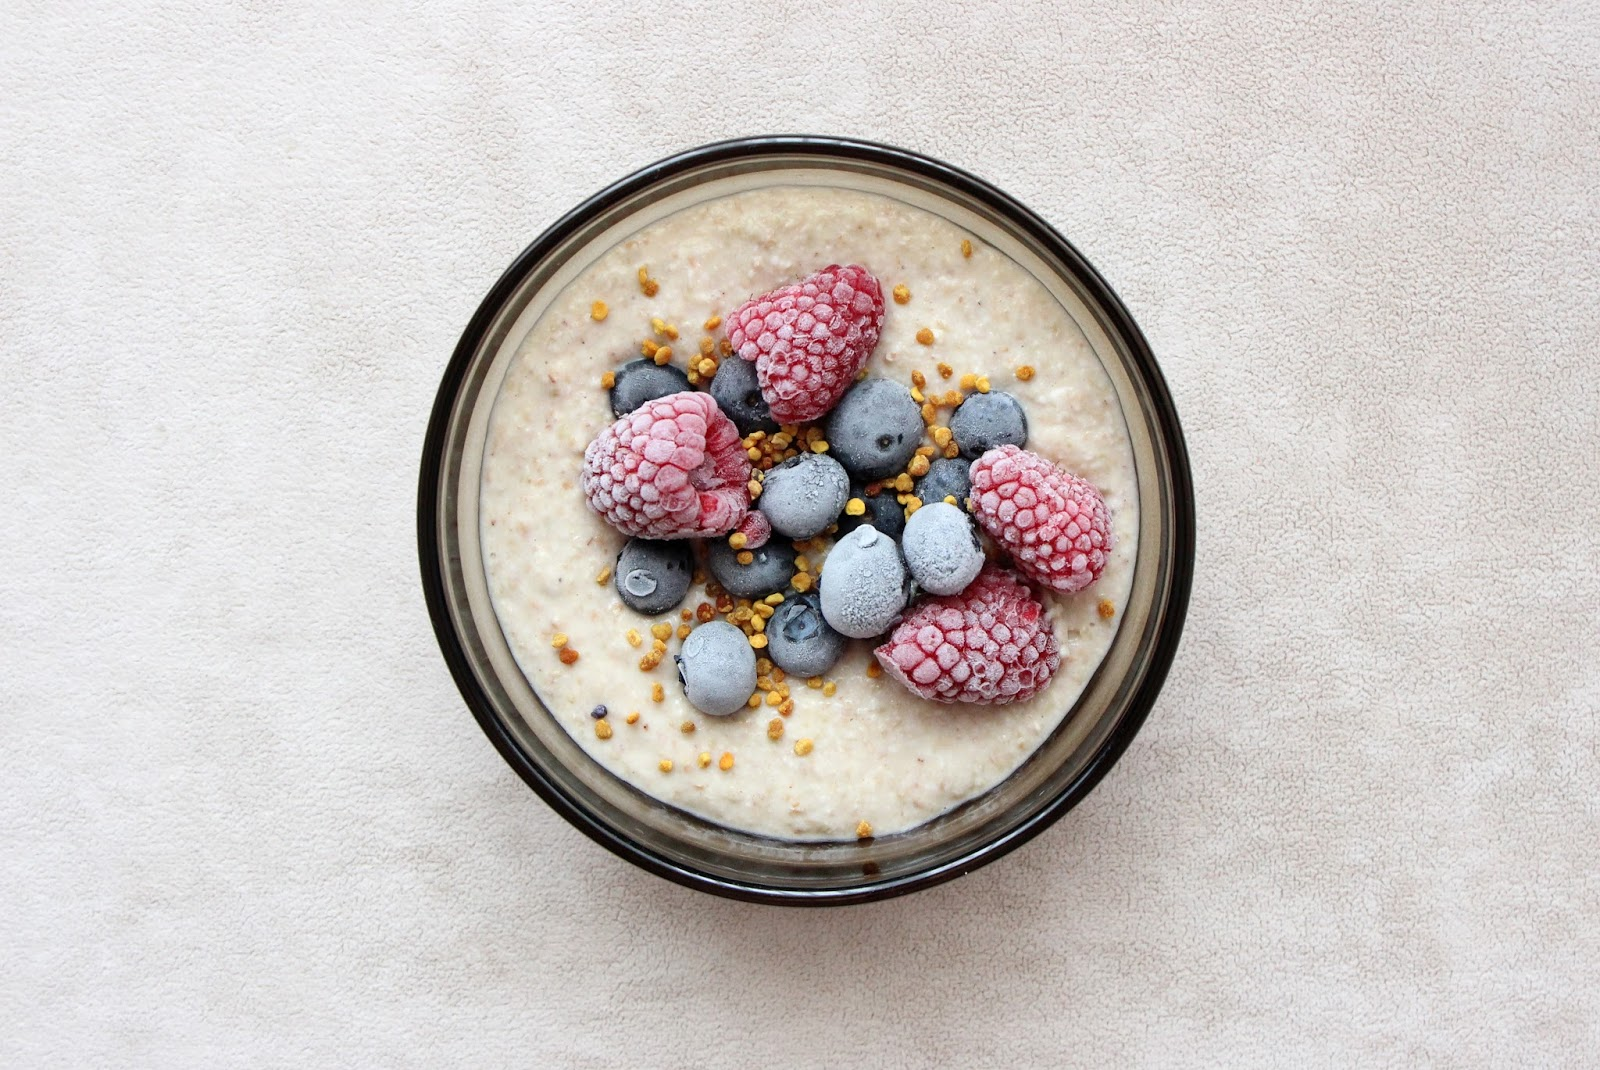 Food For Convalescence - Porridge